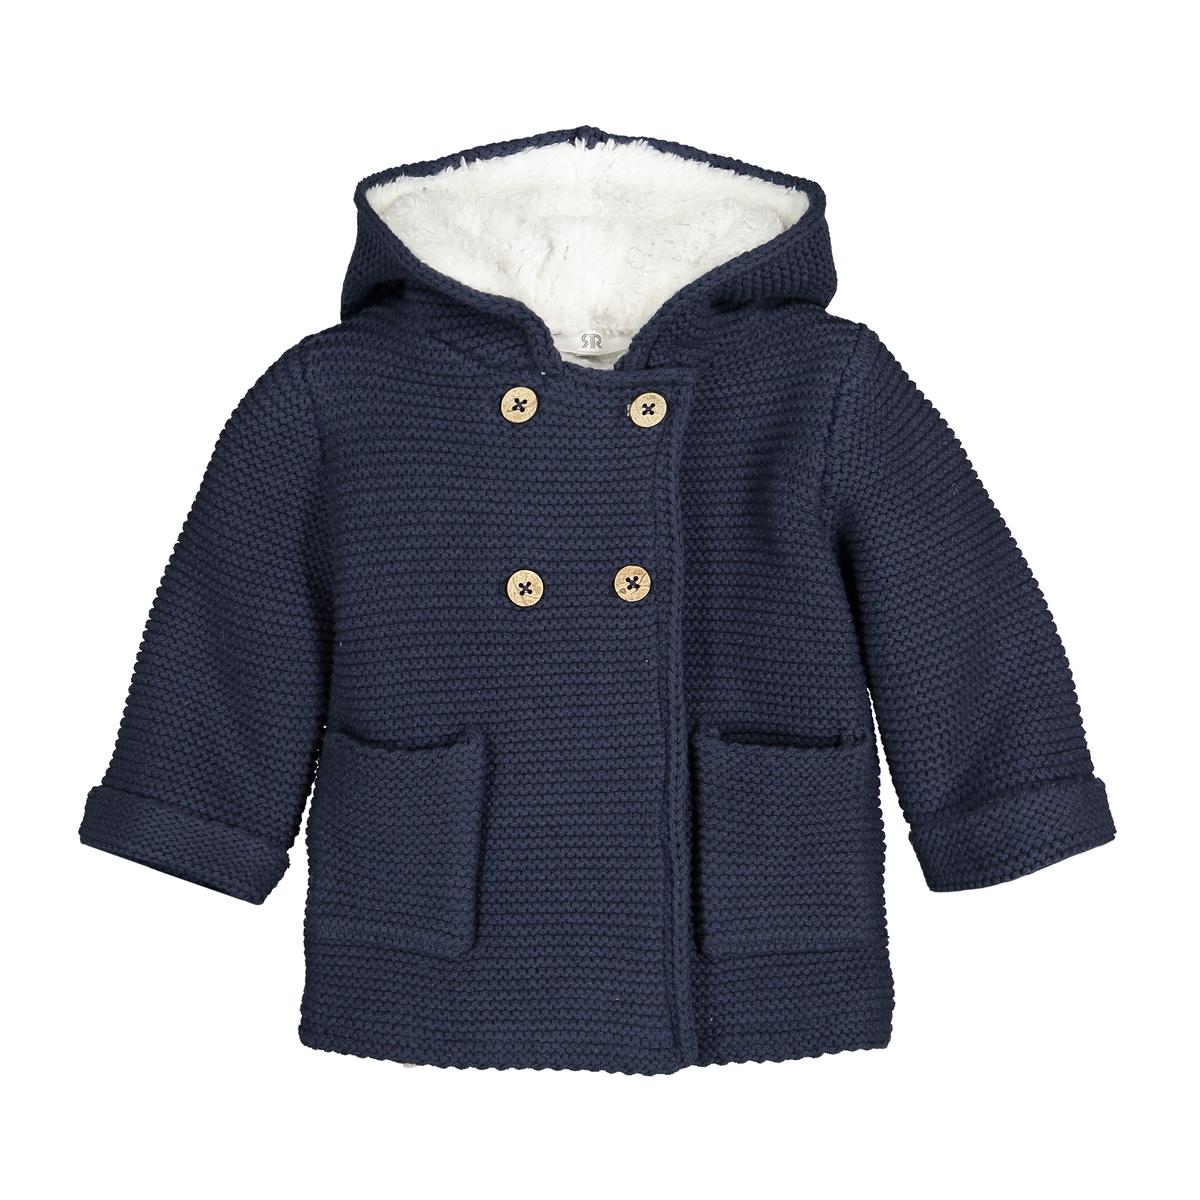 Куртка La Redoute С капюшоном на подкладке из флиса месяцев- года 0 мес. - 50 см синий куртка la redoute в горошек на подкладке из флиса мес года 1 мес 54 см синий